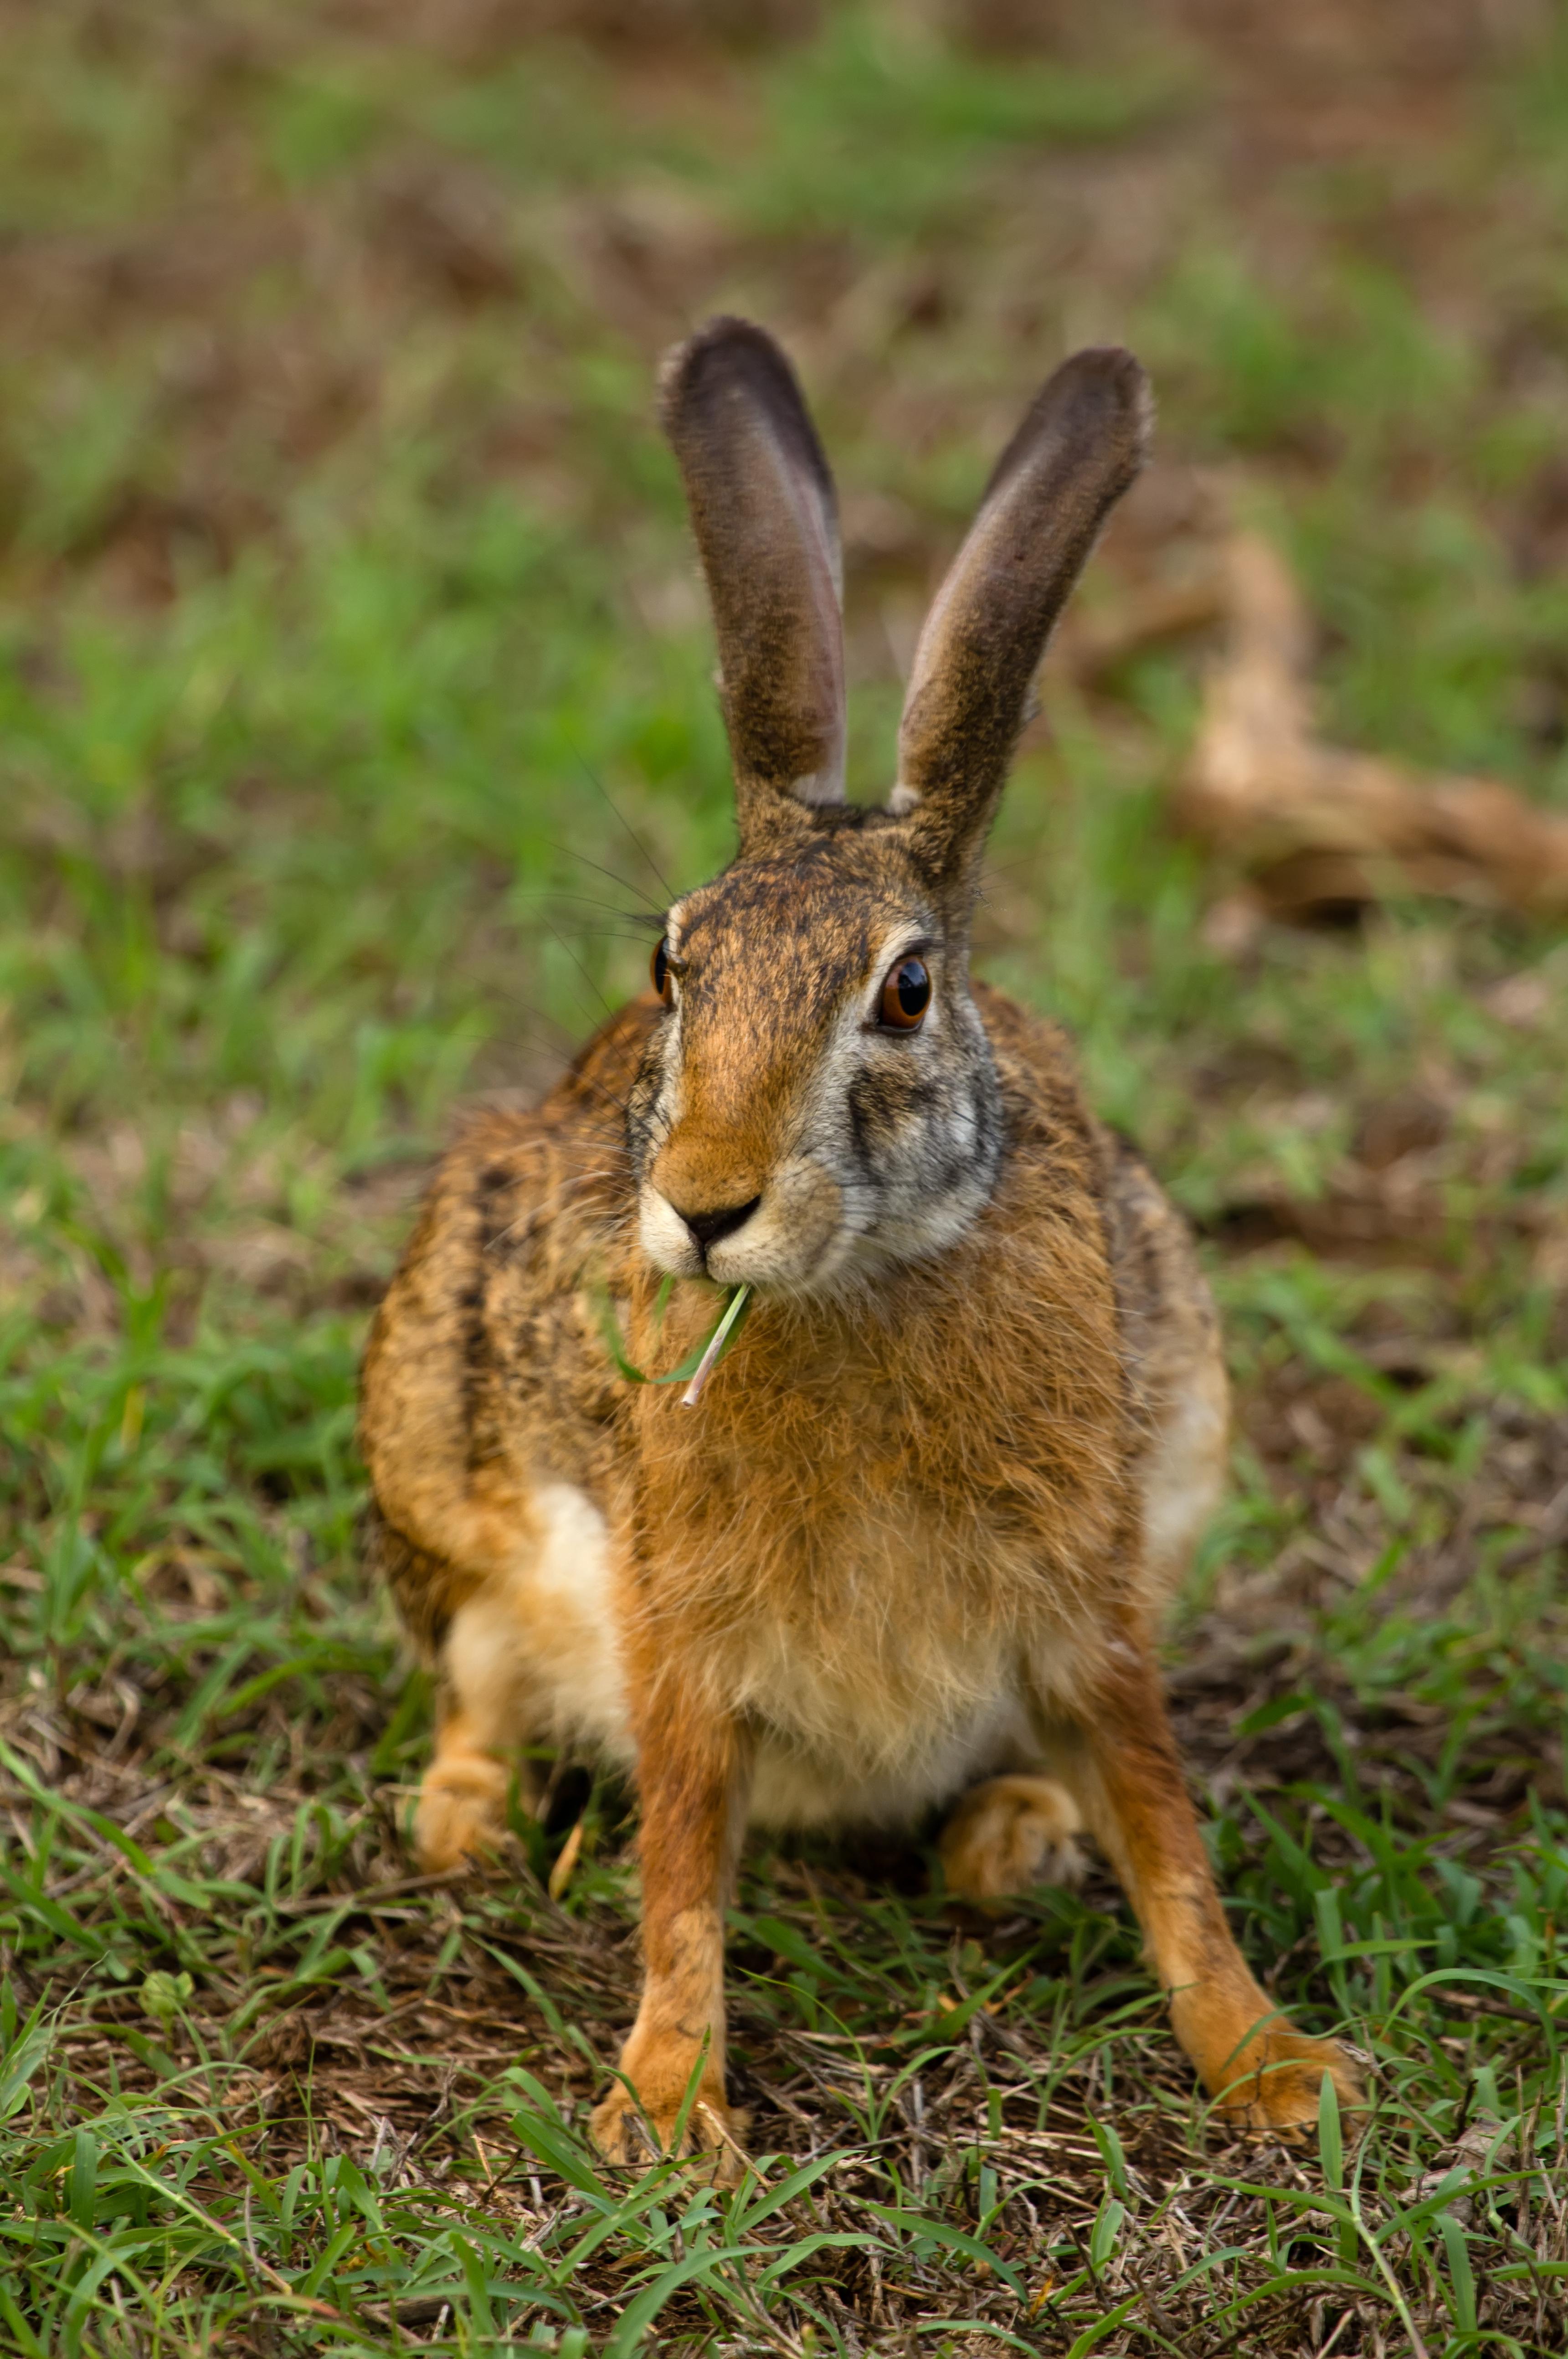 Description Black Naped Hare.jpg: commons.wikimedia.org/wiki/File:Black_Naped_Hare.jpg